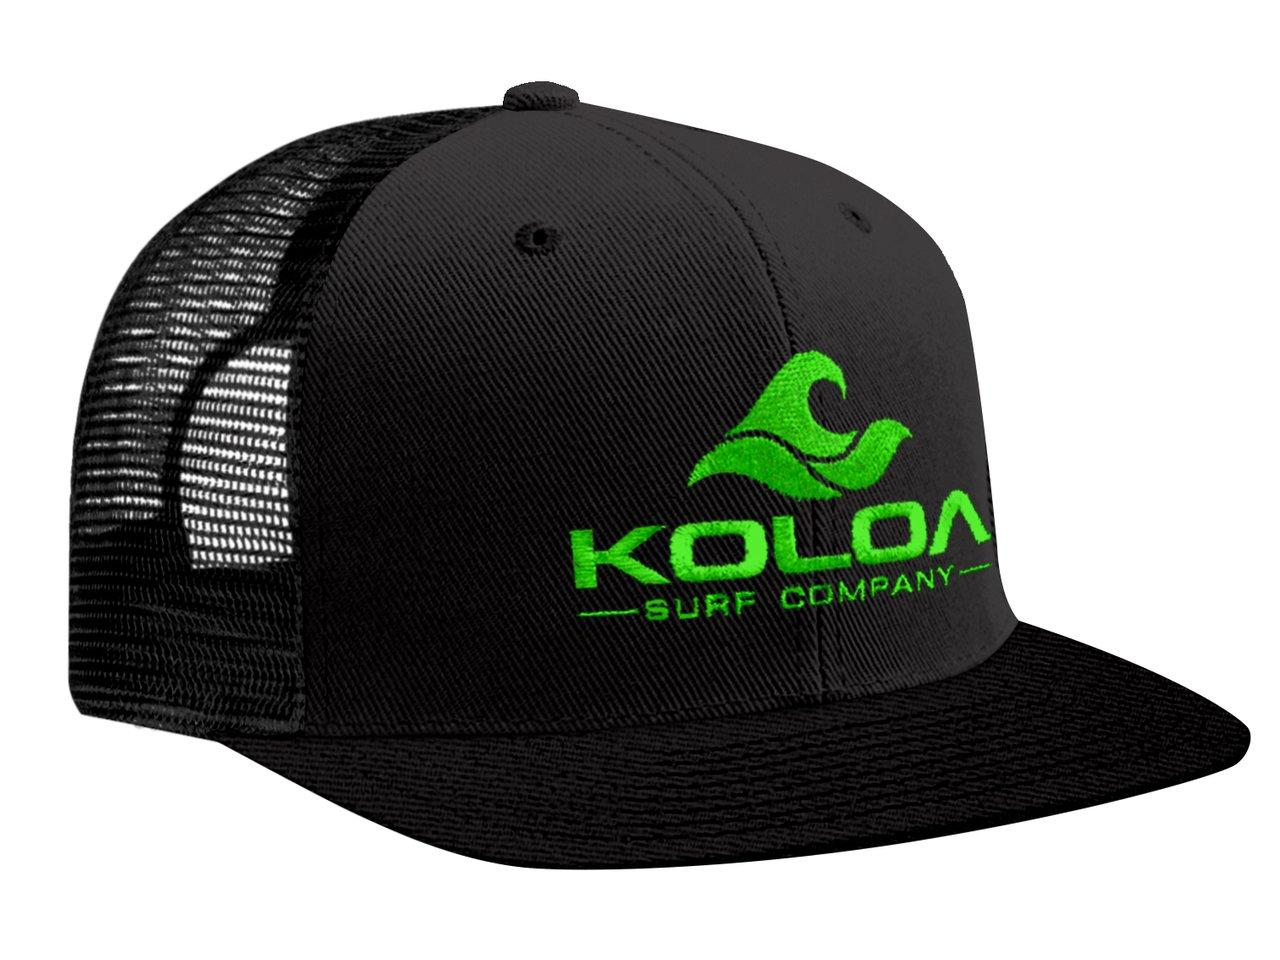 b59790d7 Koloa Surf Classic Mesh Back Trucker Hats in 12 Colors product image